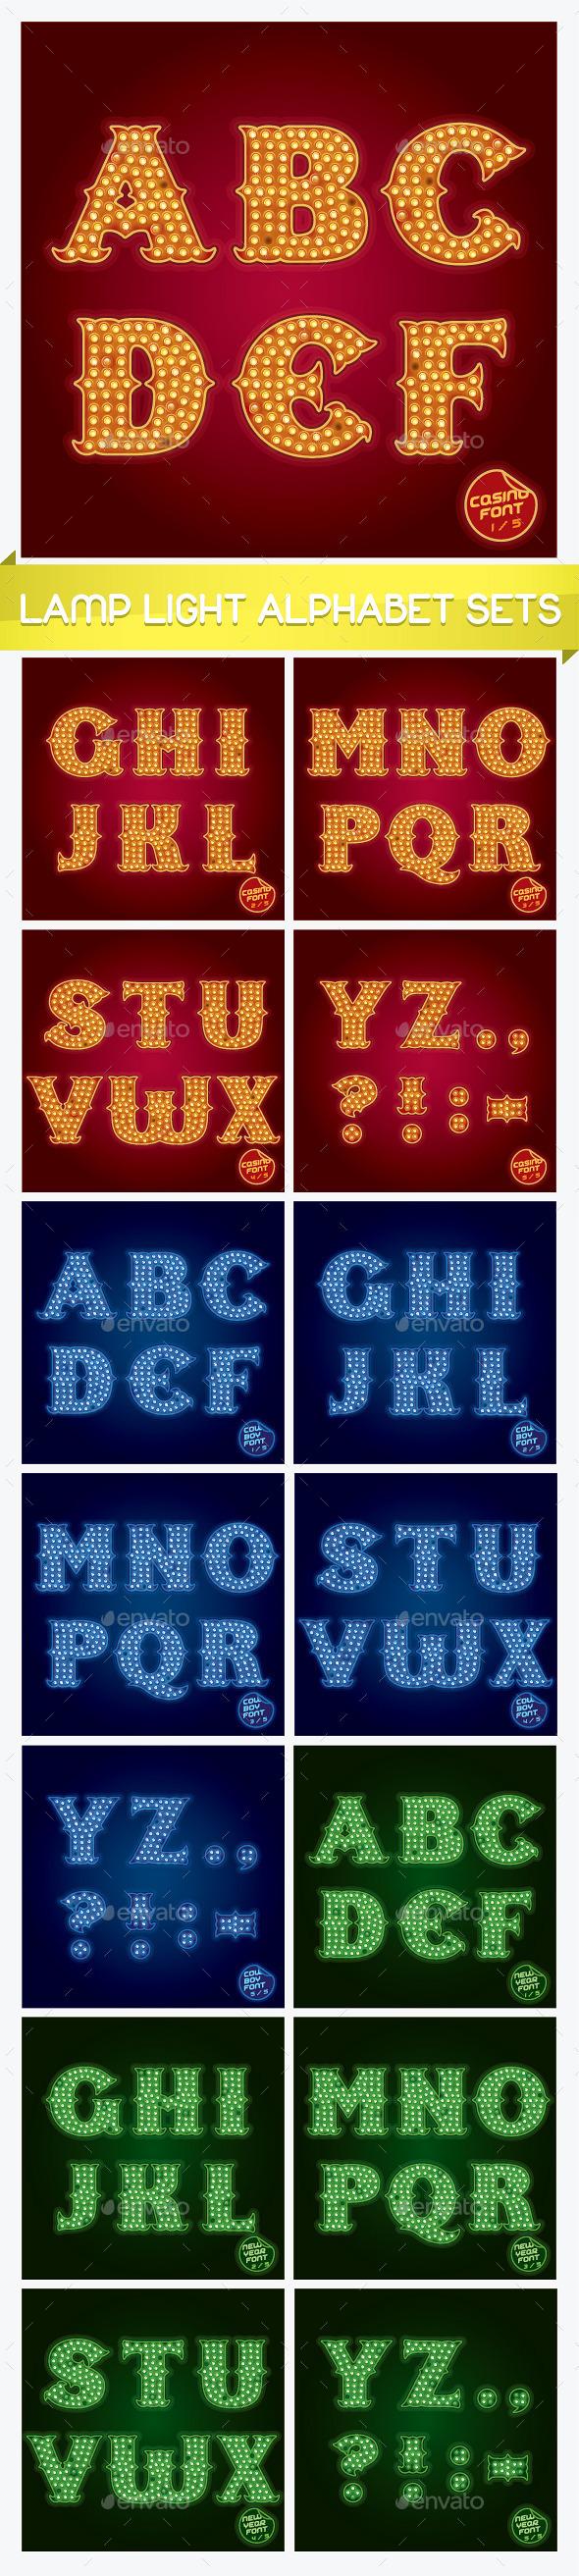 GraphicRiver Lamp Light Alphabet Sets 11909806